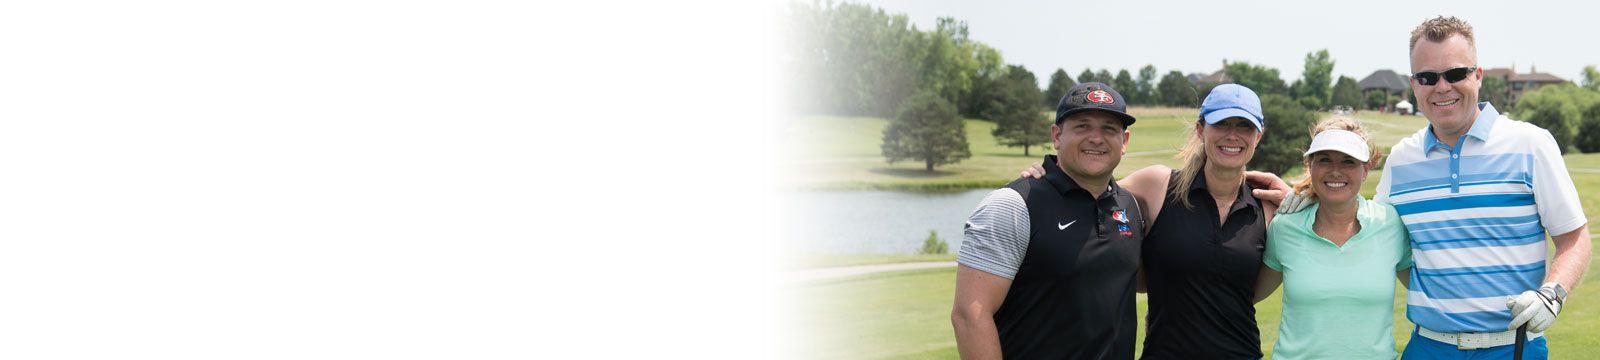 Gateway Sertoma Golf Event